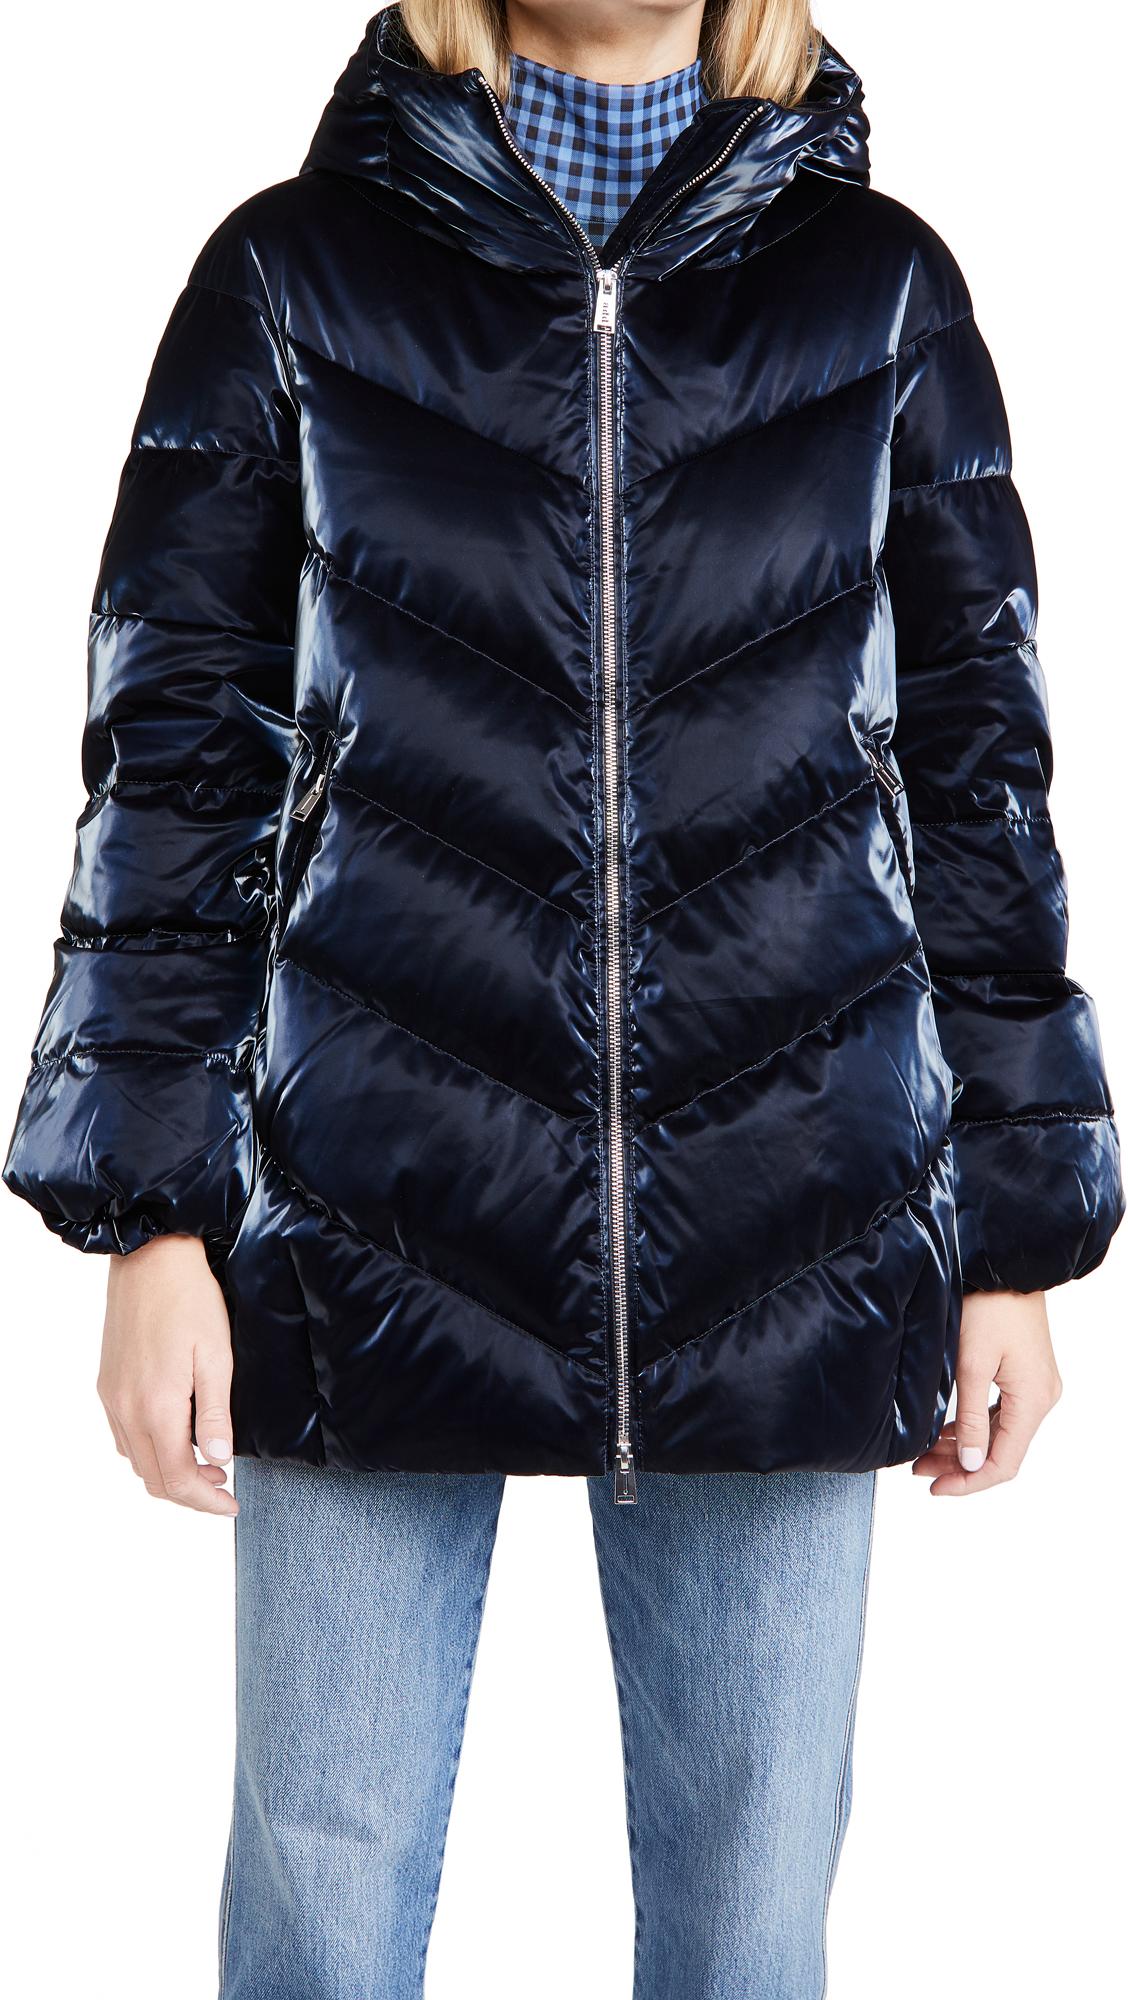 Add Down Hooded Jacket